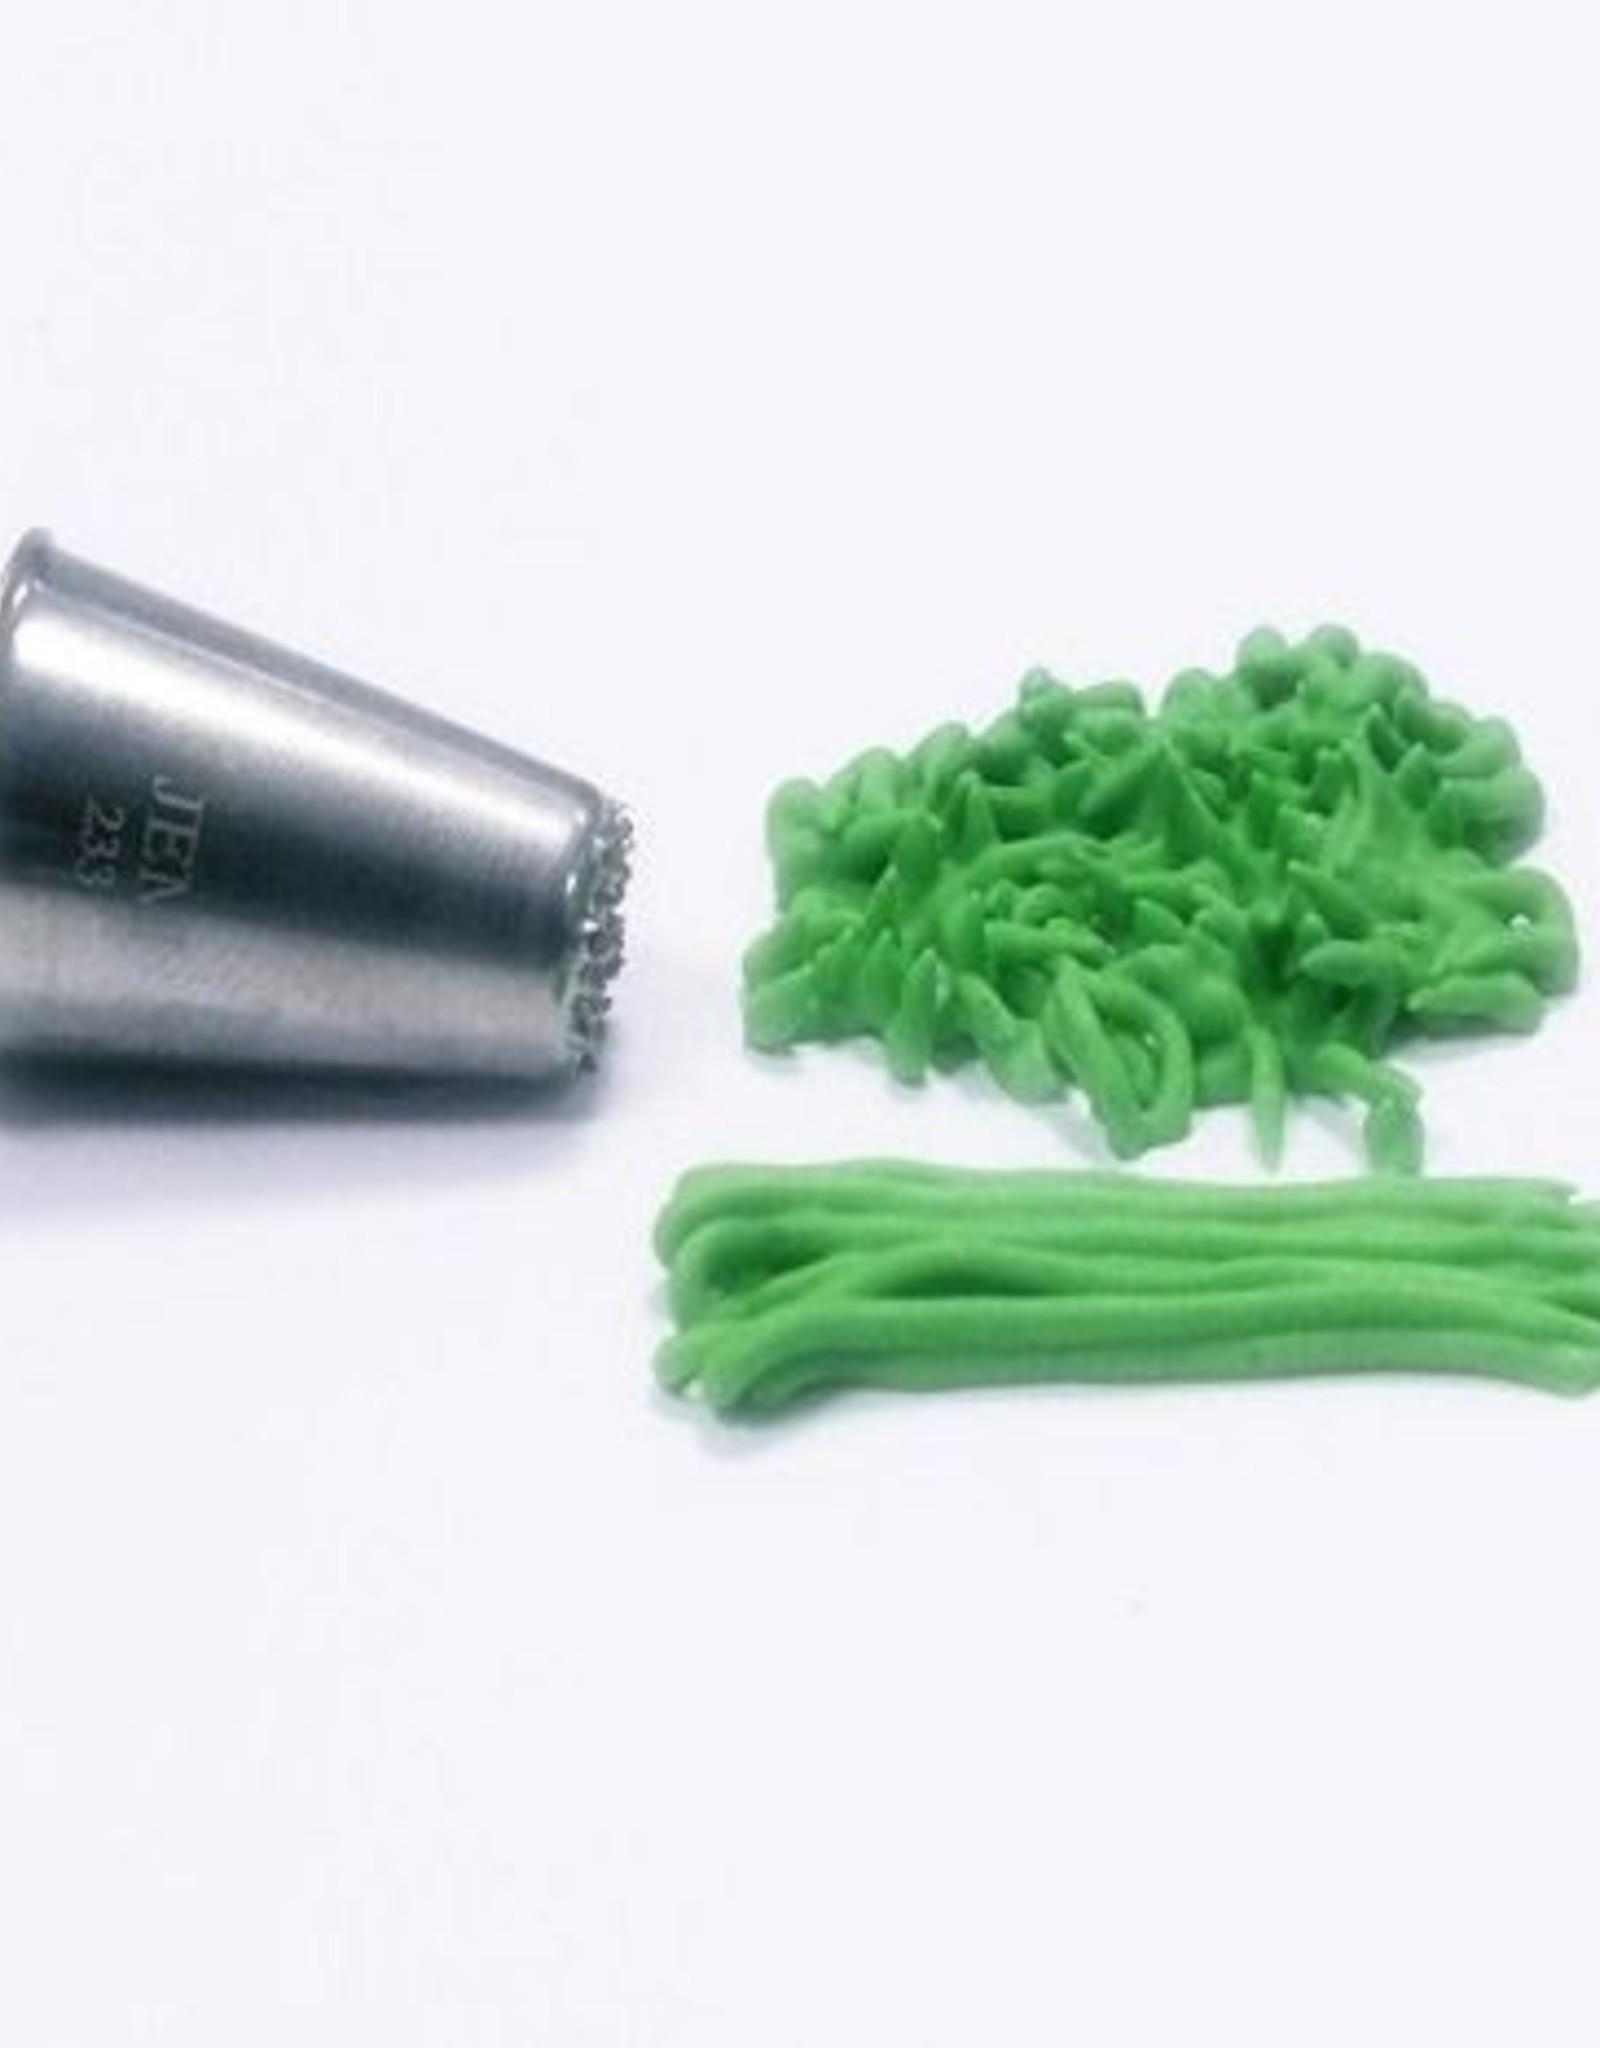 JEM JEM Small Hair/Grass Multi-Opening Nozzle #233